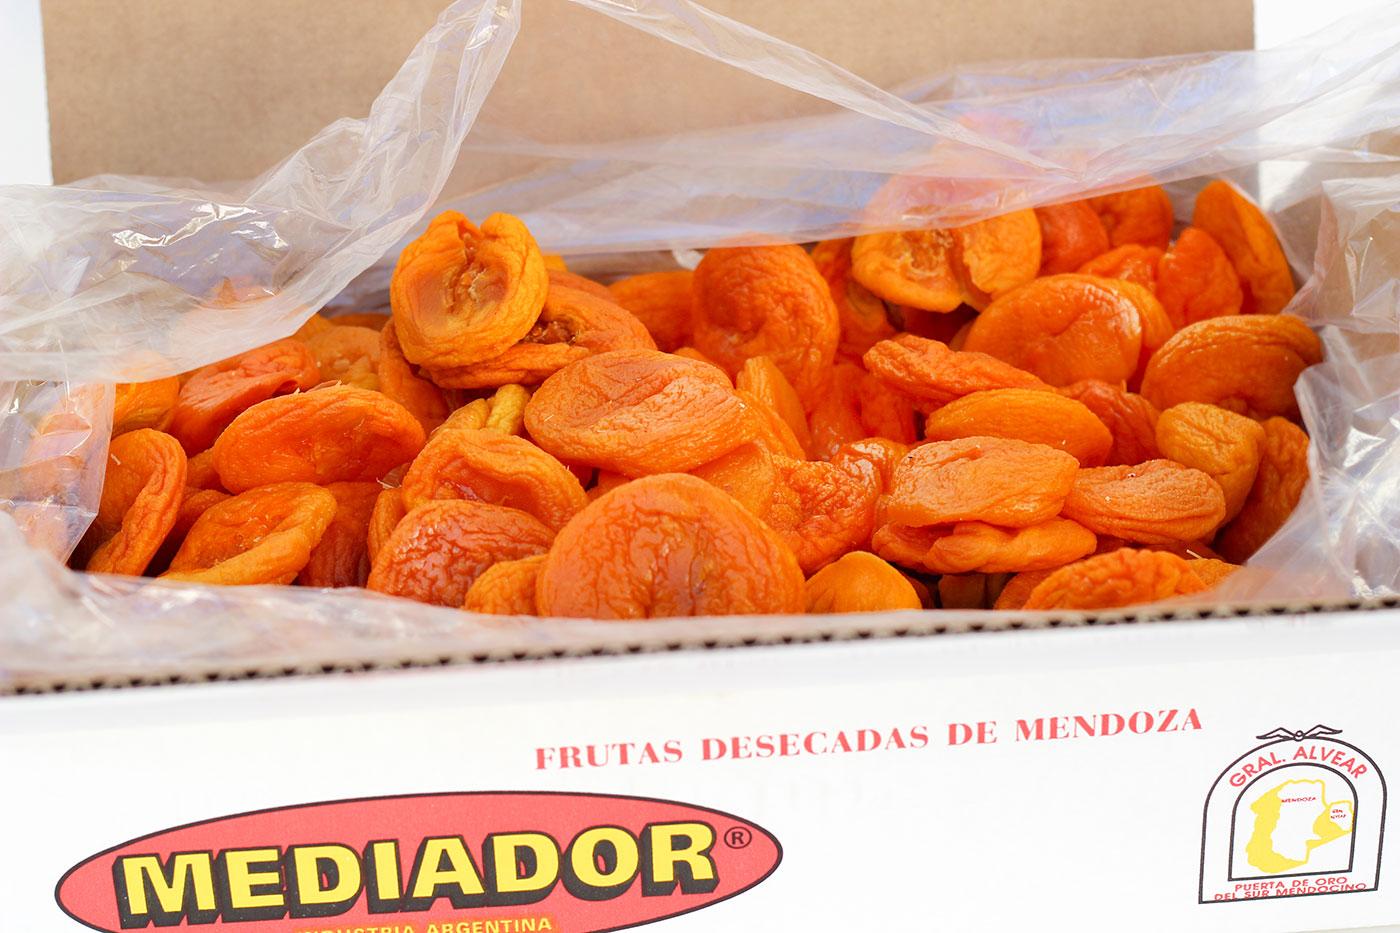 packing durazno seco sin carozo